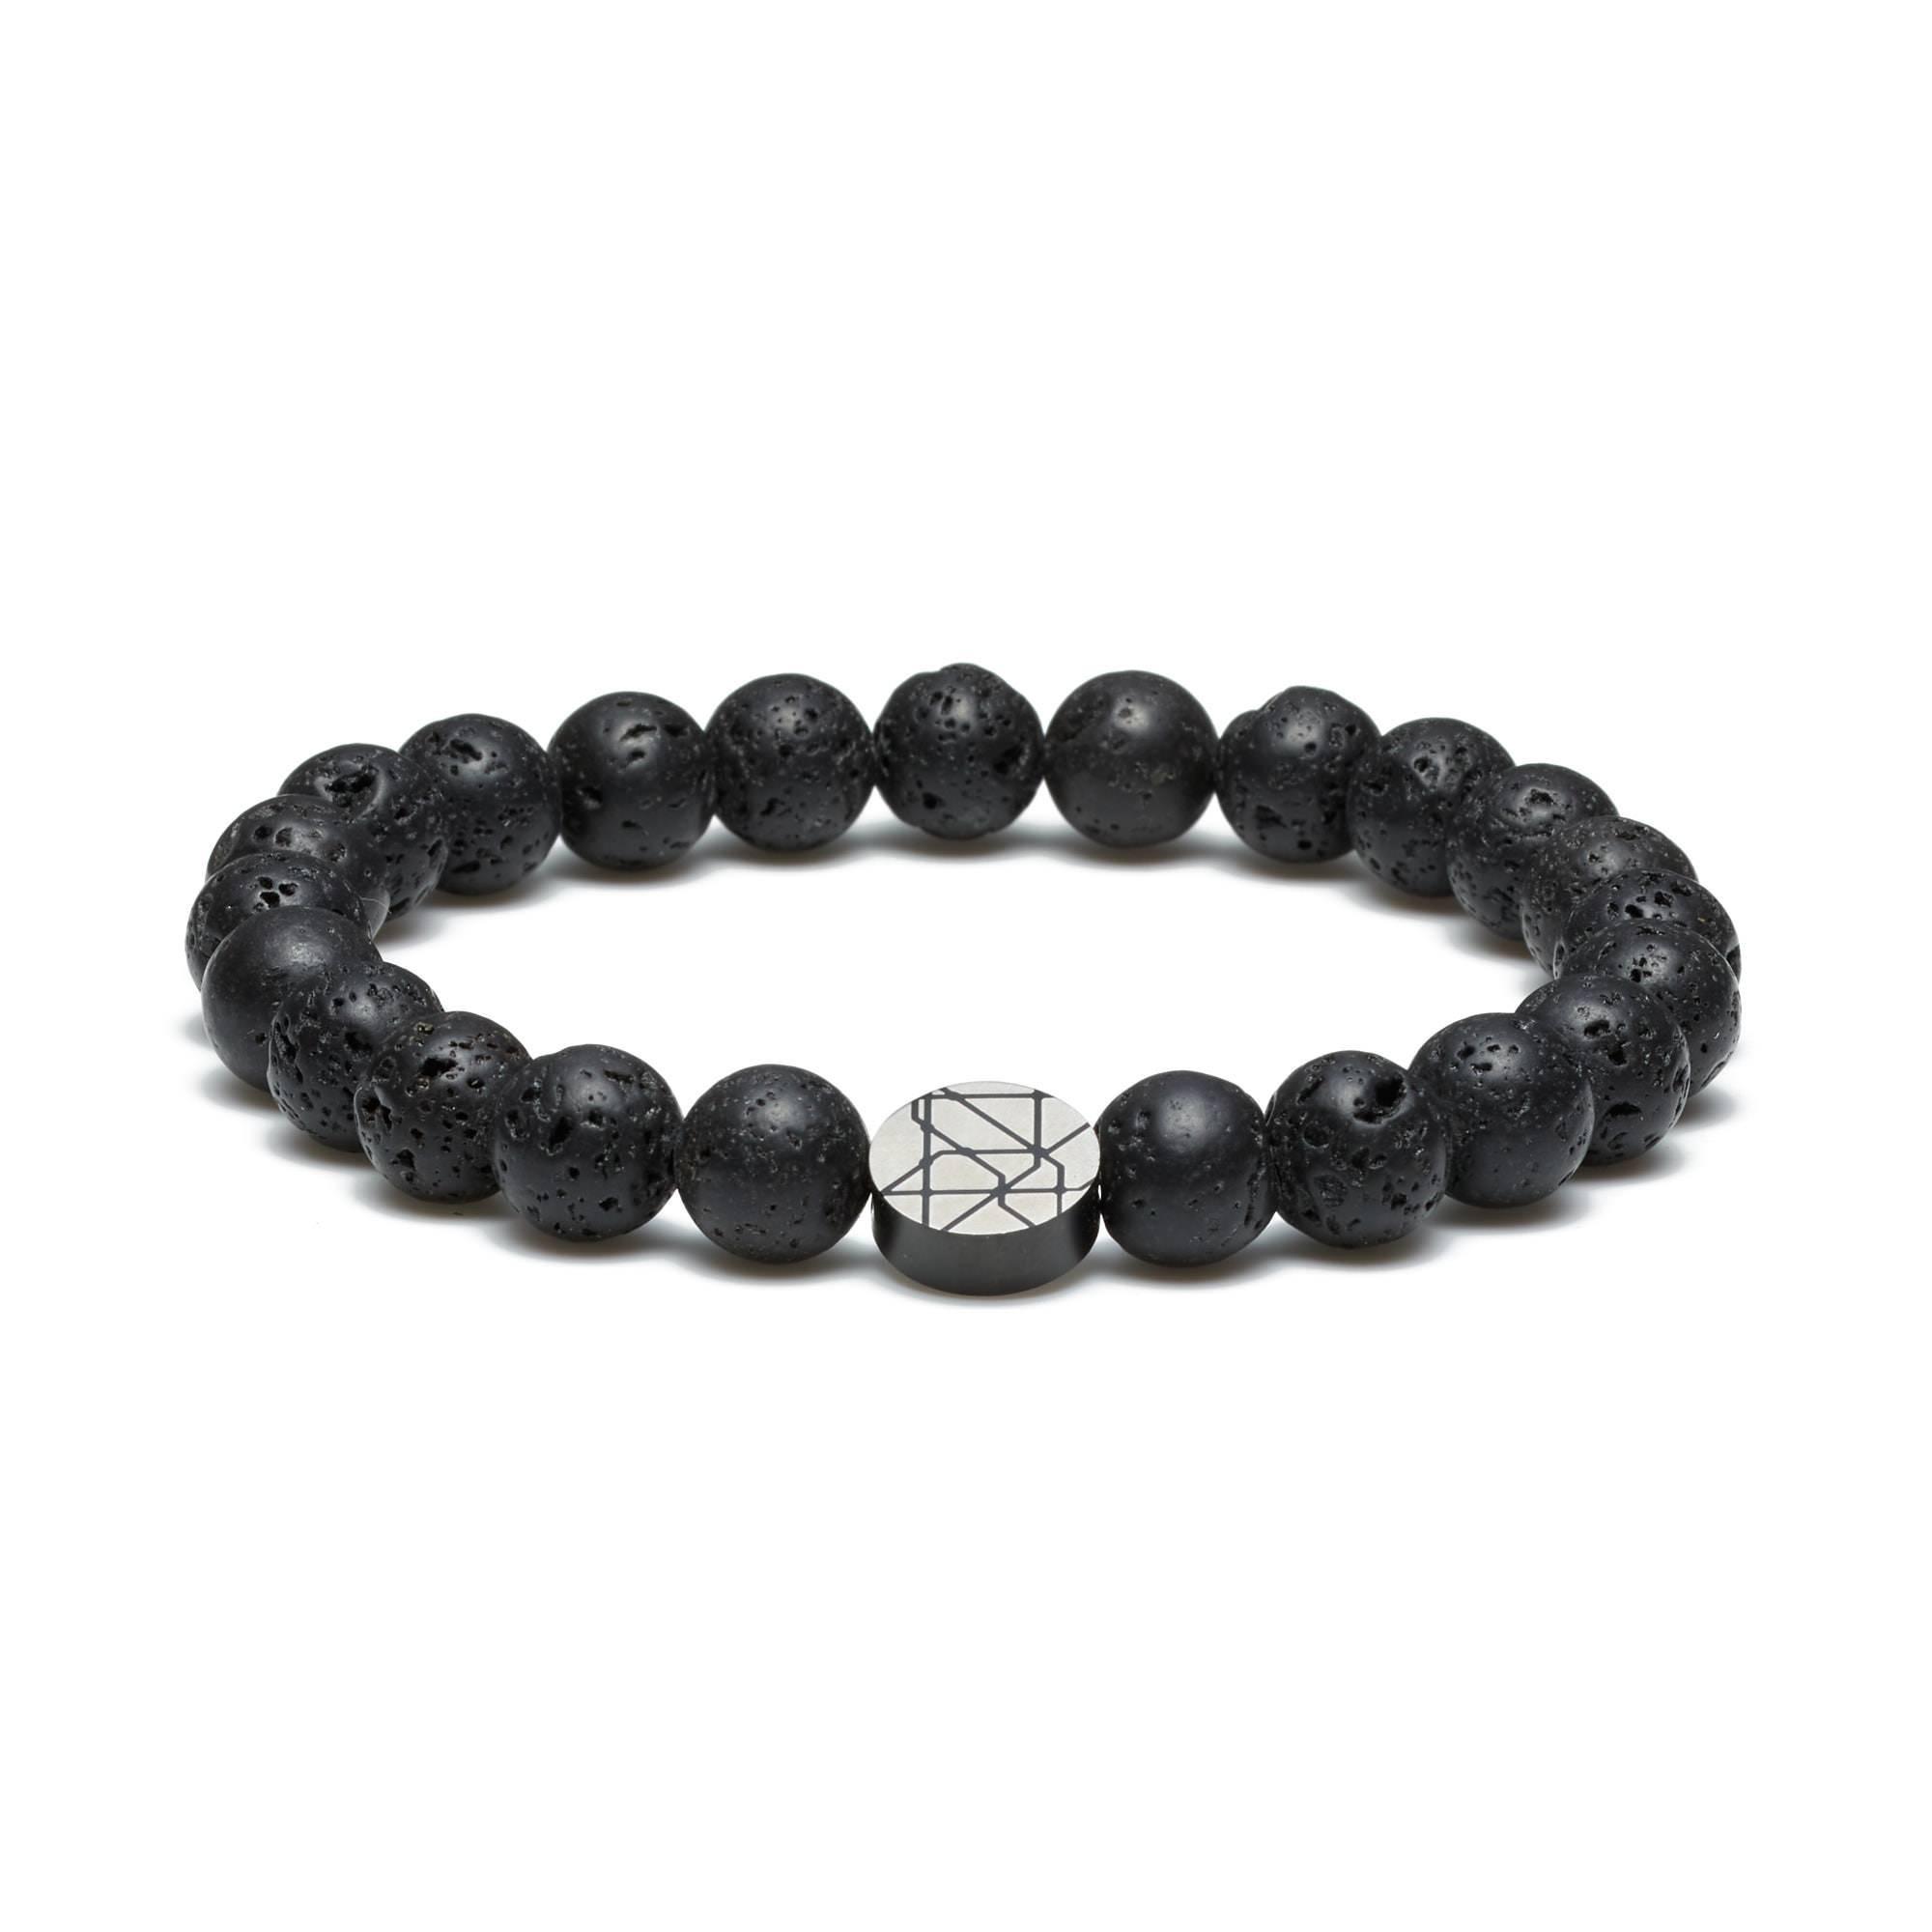 Bakerloo Charing Cross leather bracelet black/grey size M